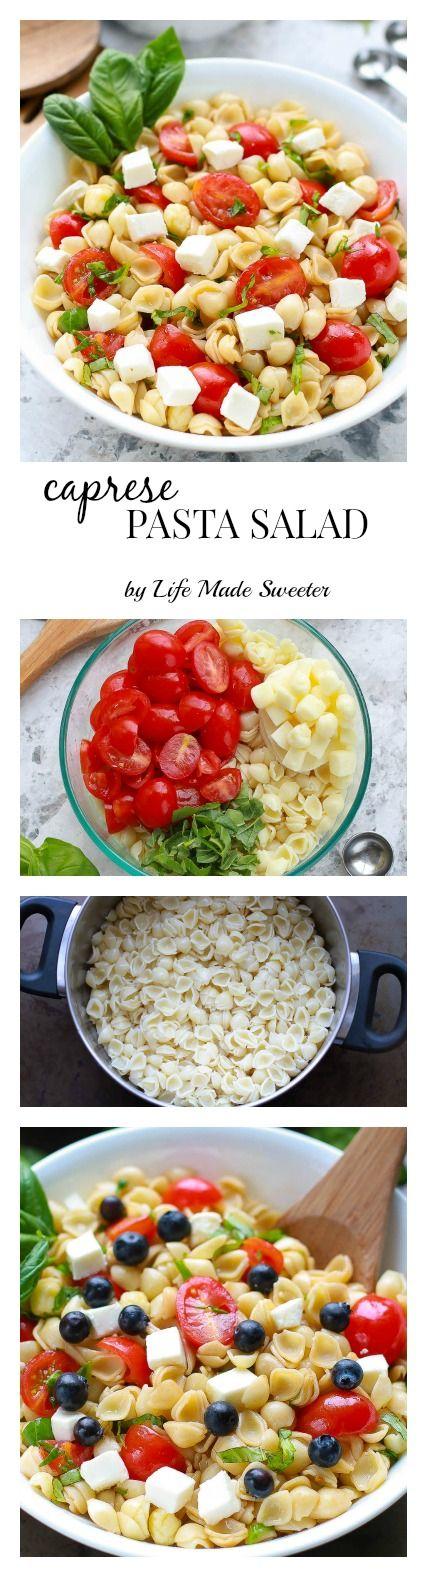 Caprese Pasta Salad Recipe The Cheese Salad Recipes